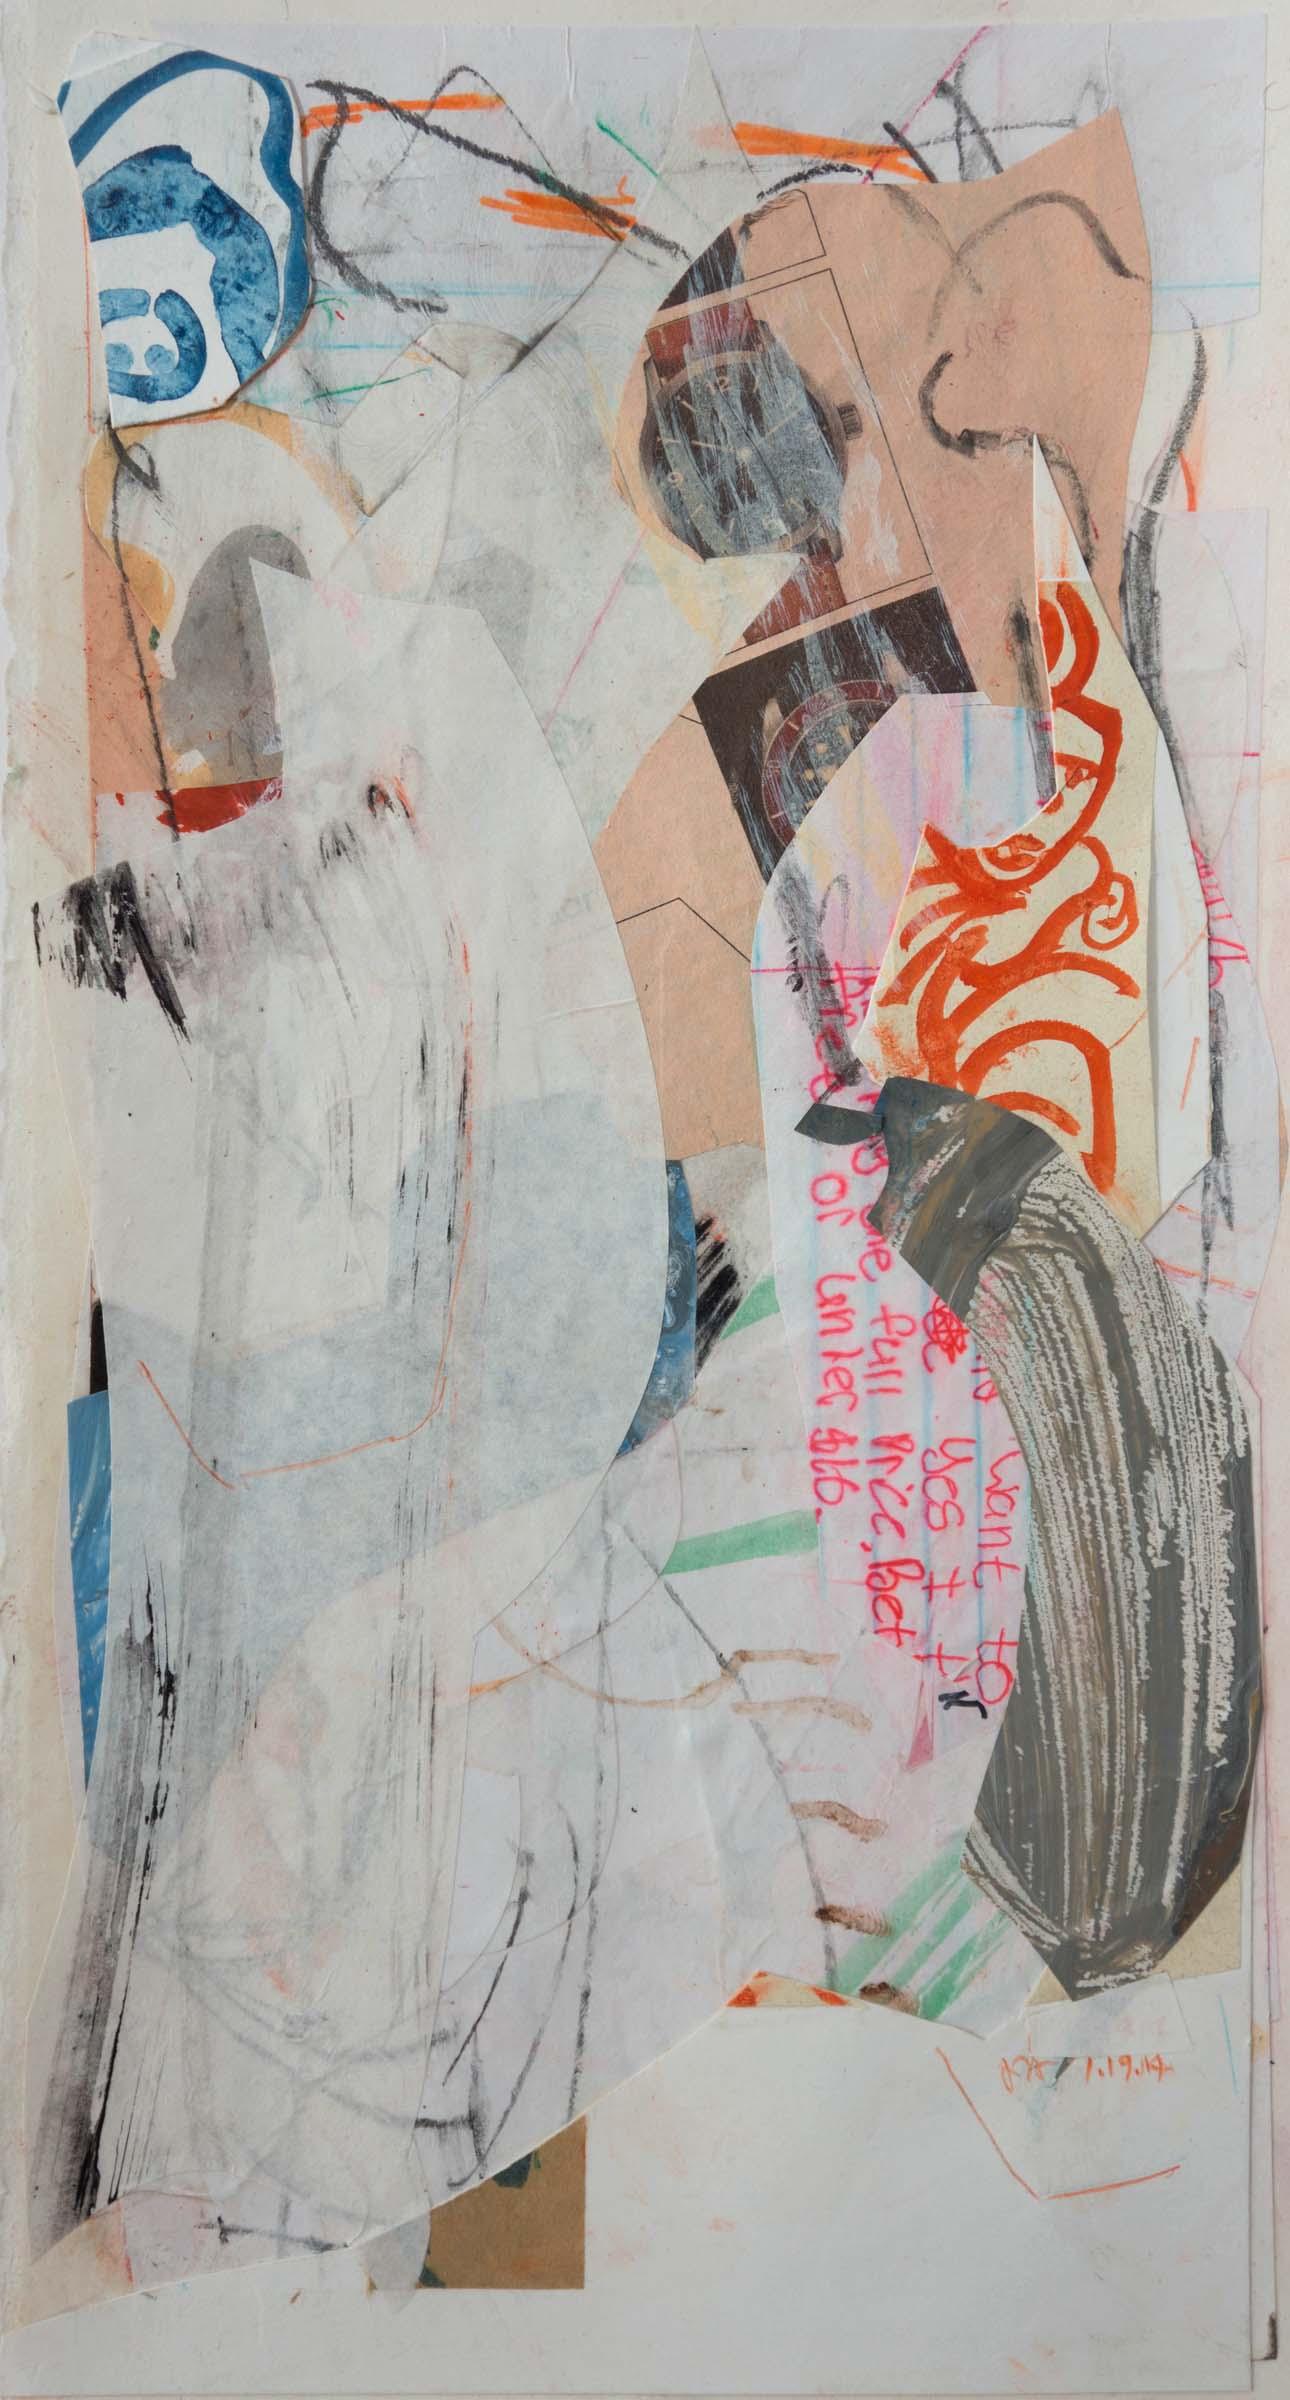 site-1-19-14 collage 1a  33x17.5cm.jpg